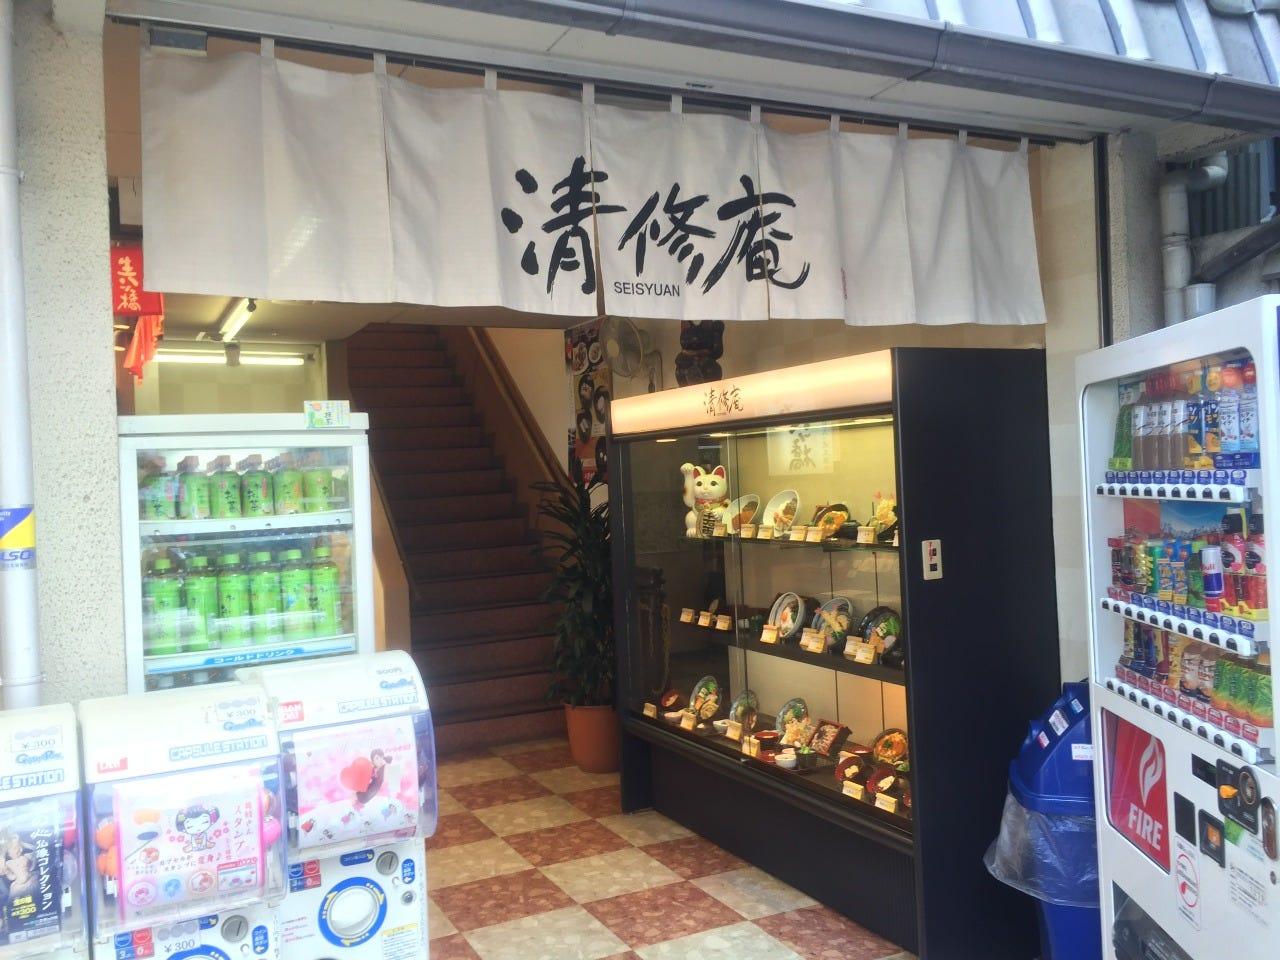 SEISYUAN Kiyomizuten